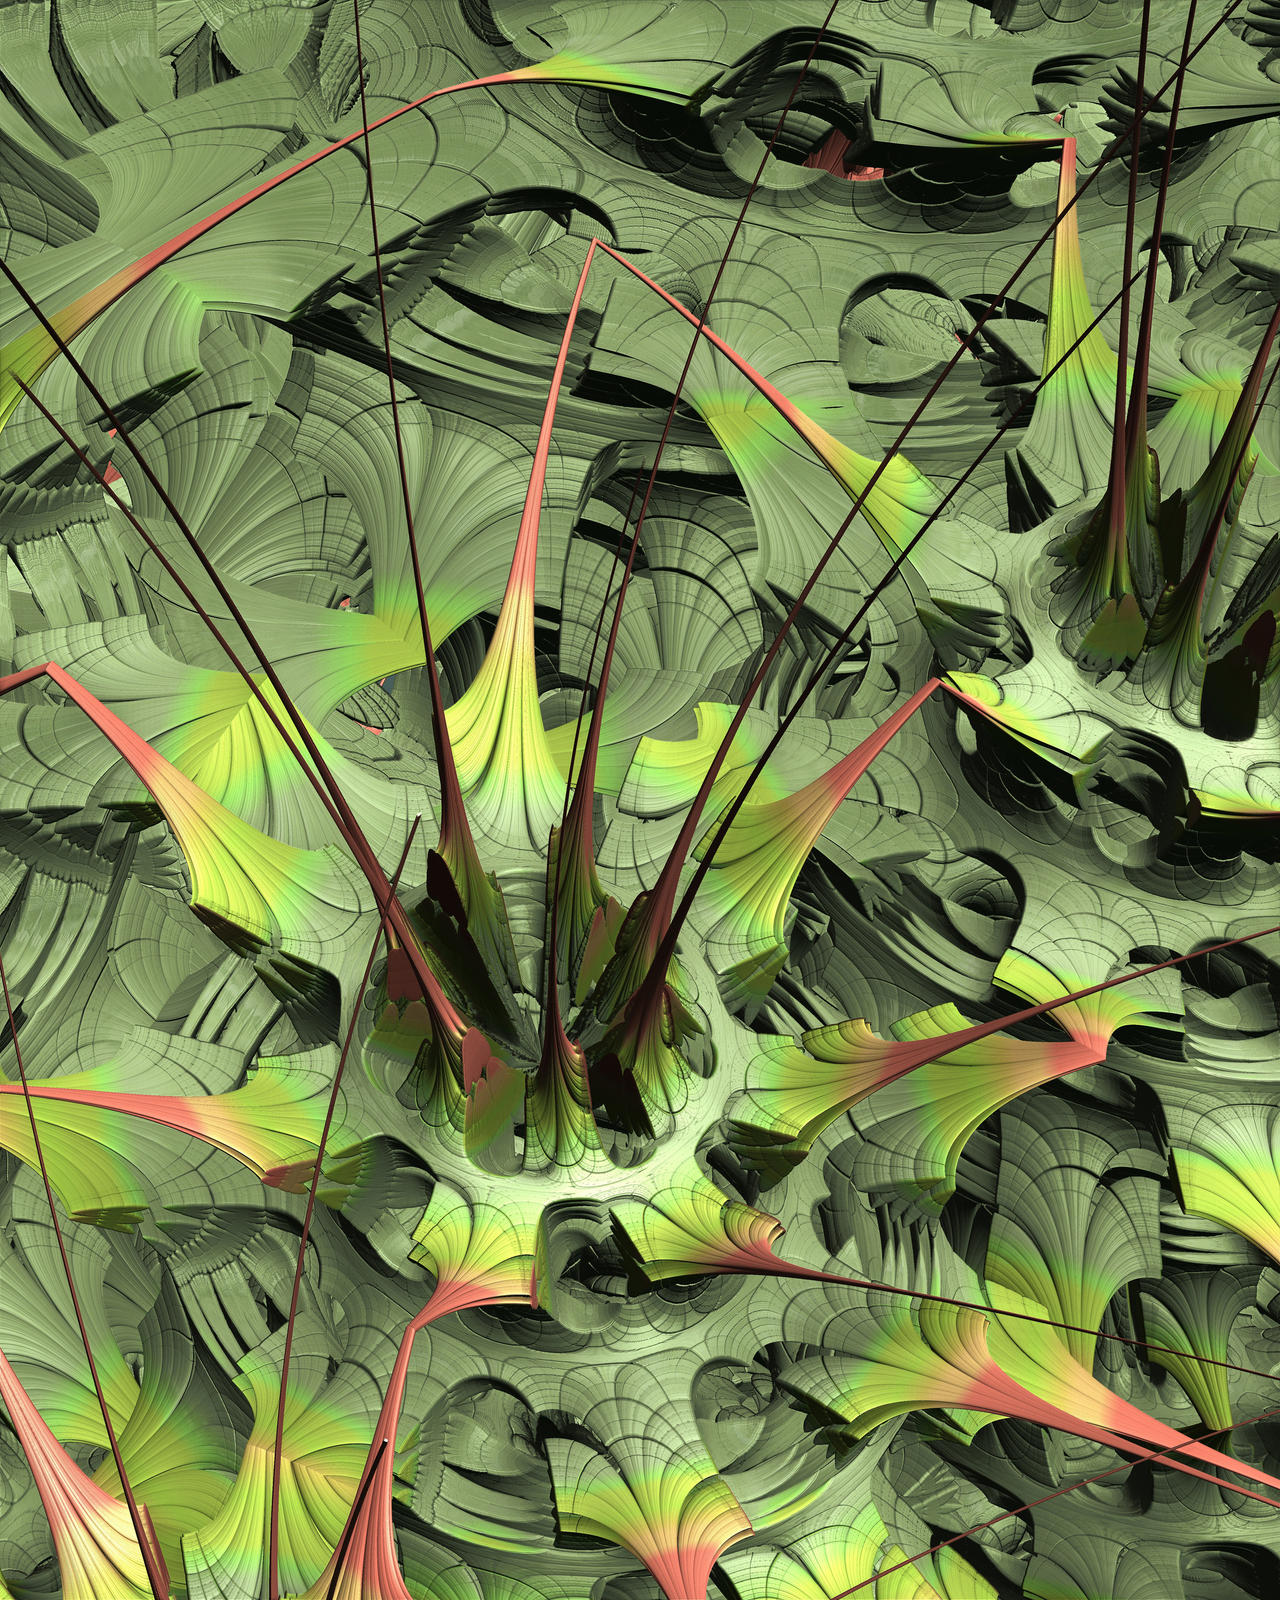 Siebenbluetler by Bramvan